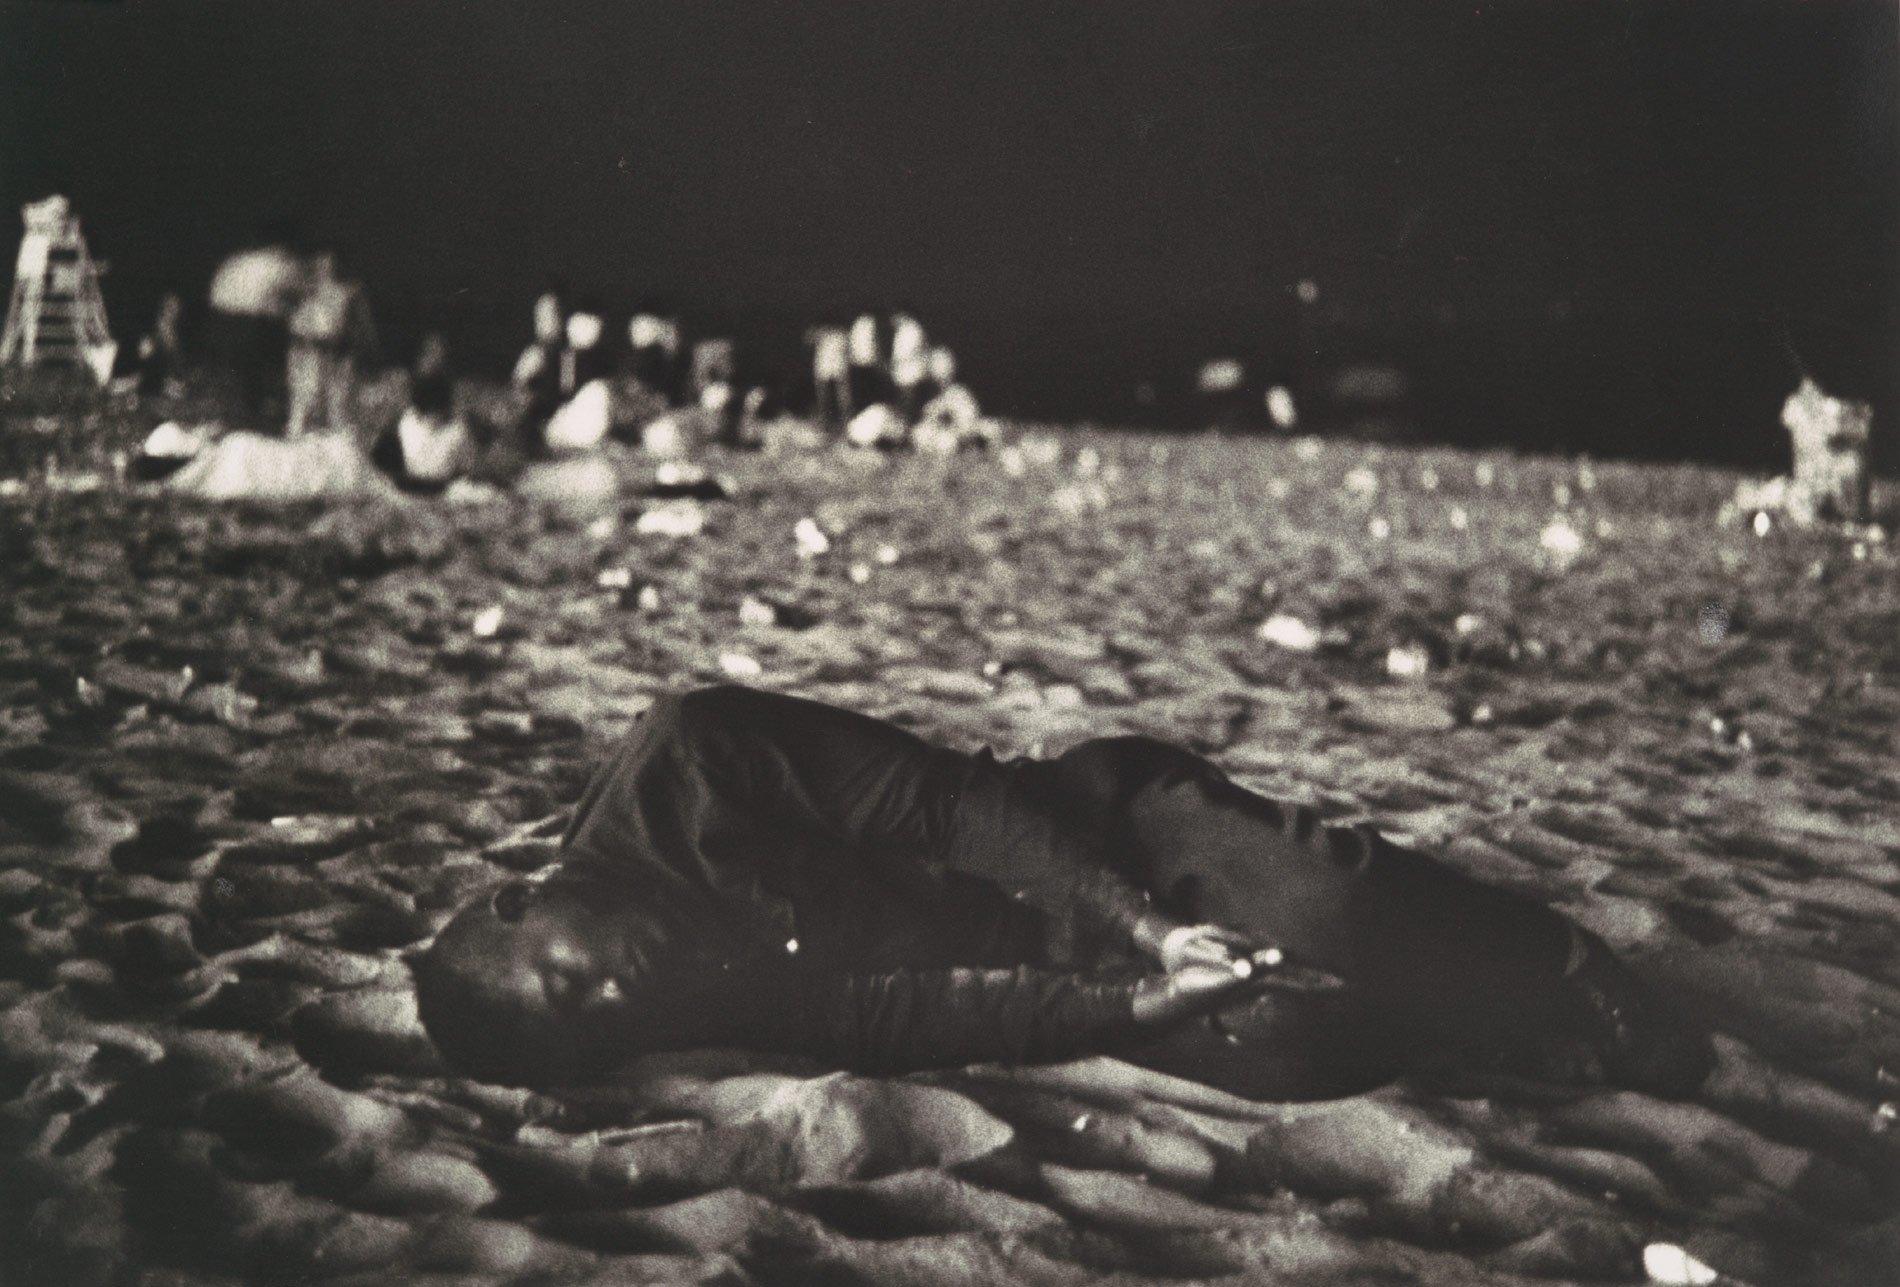 Black & White 1958 luglio, Coney Island, USA, XNUMX © Robert Frank Photography and dreams